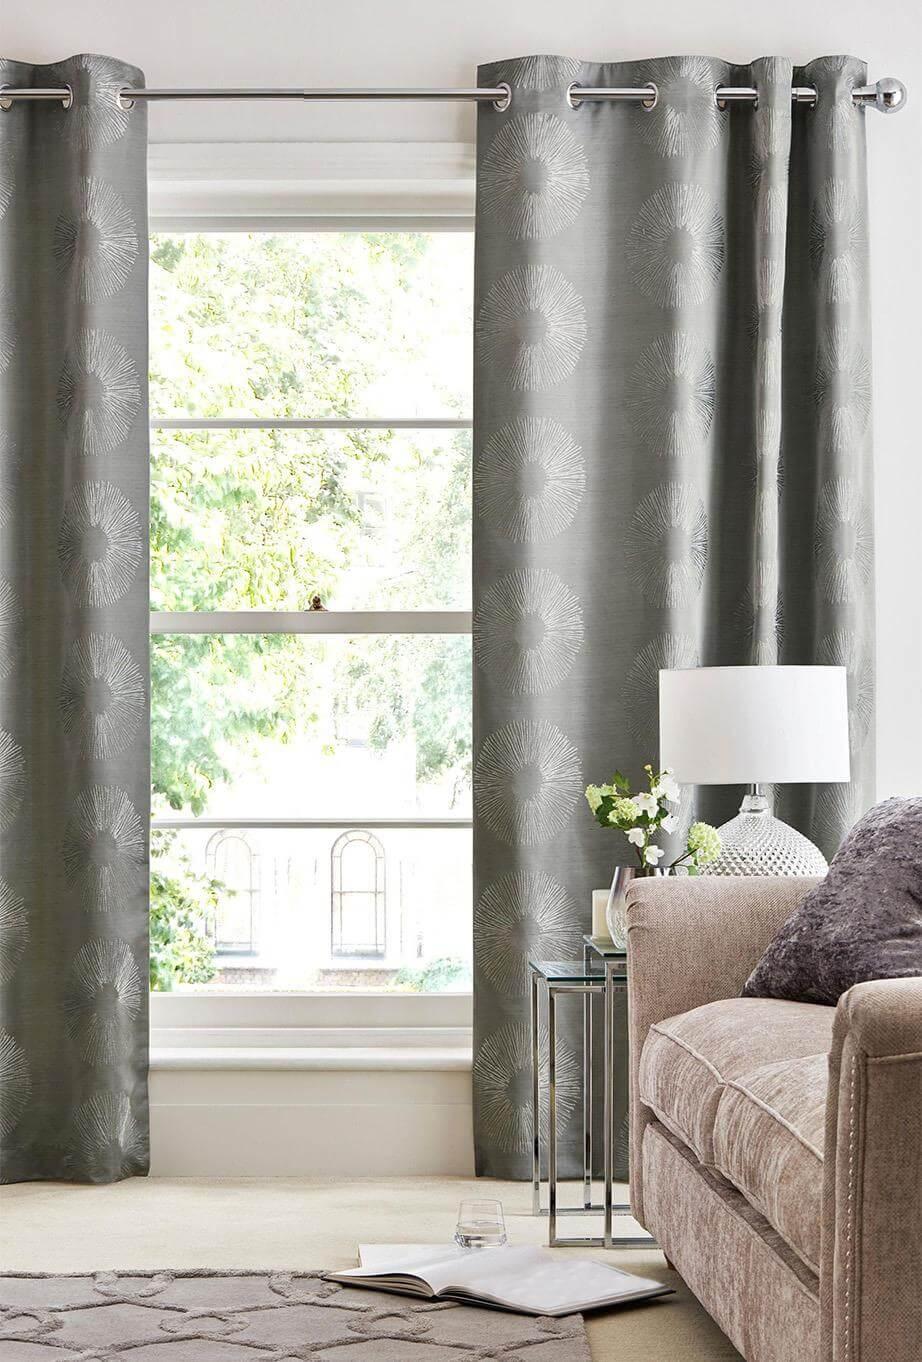 10 Лесни начина да повишите стойността на своя имот - нови завеси